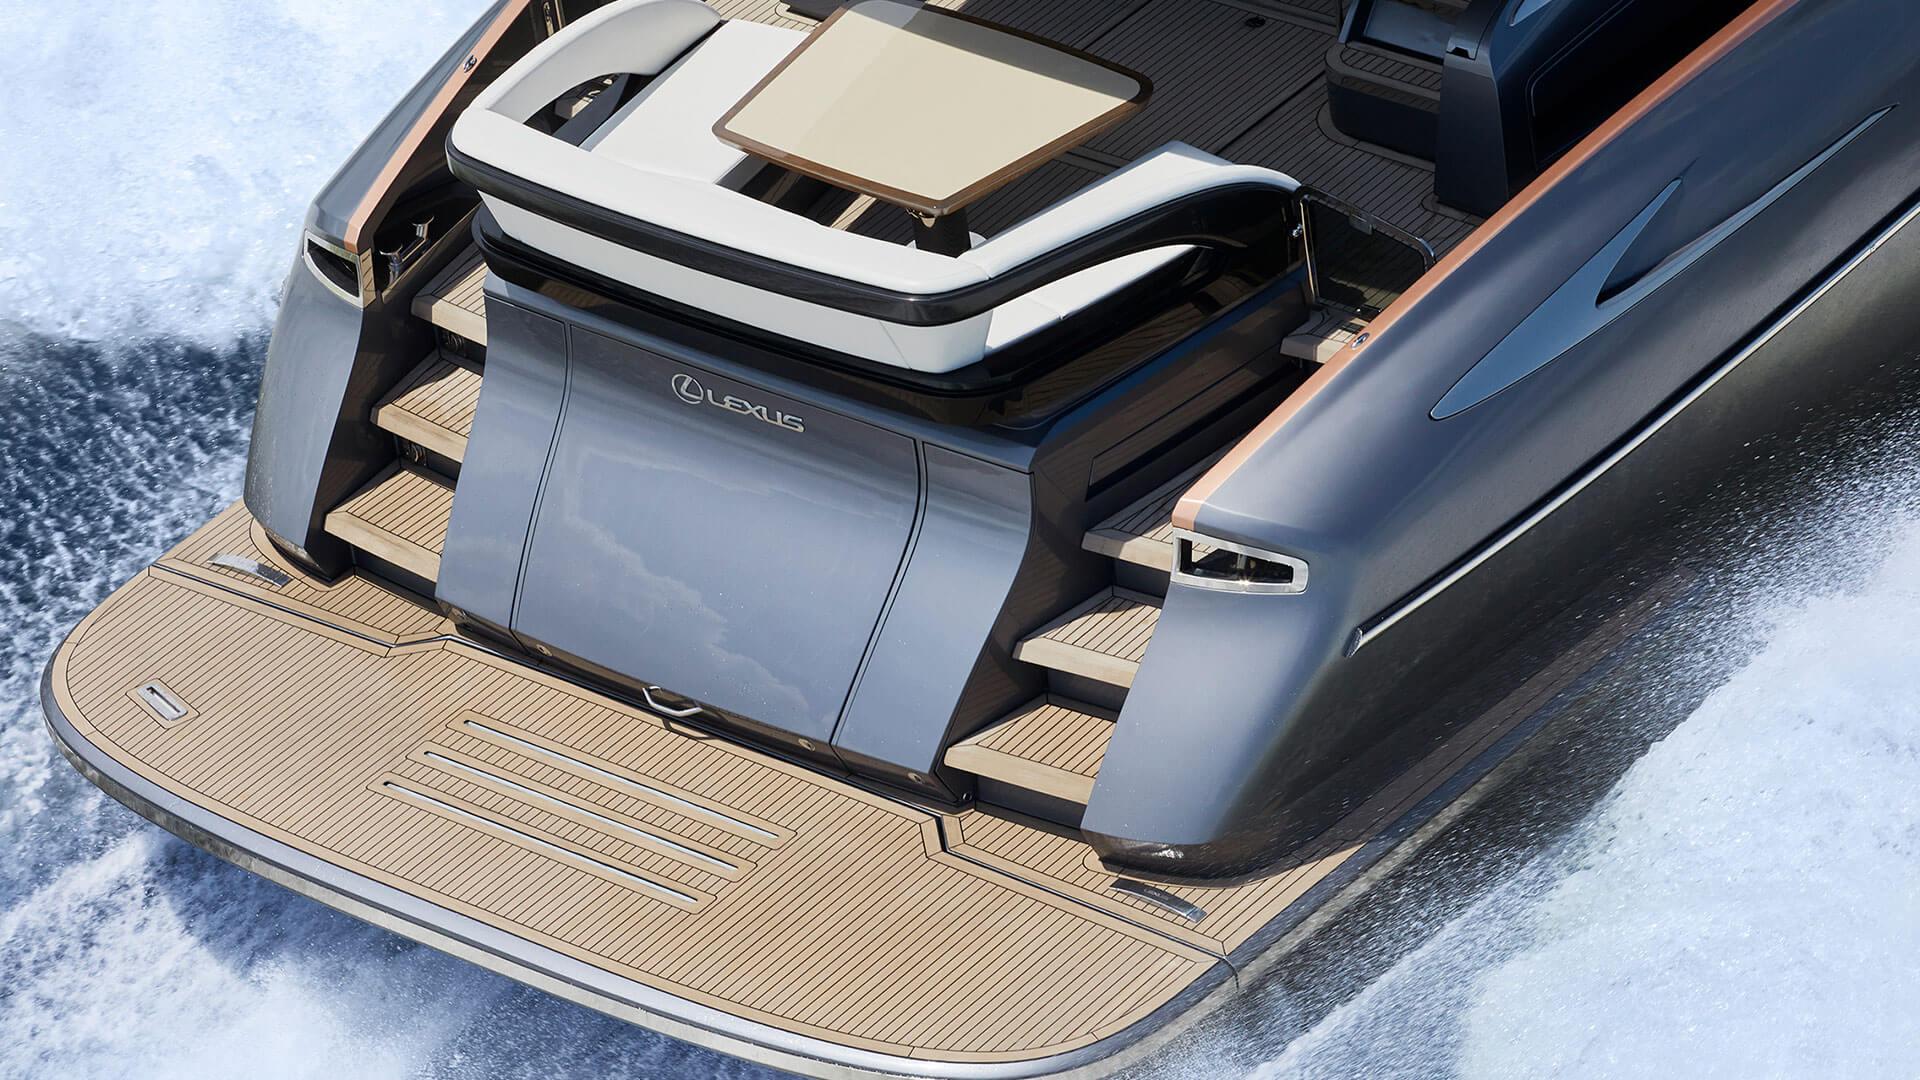 2020 lexus yacht ly 650 premiere gallery 04